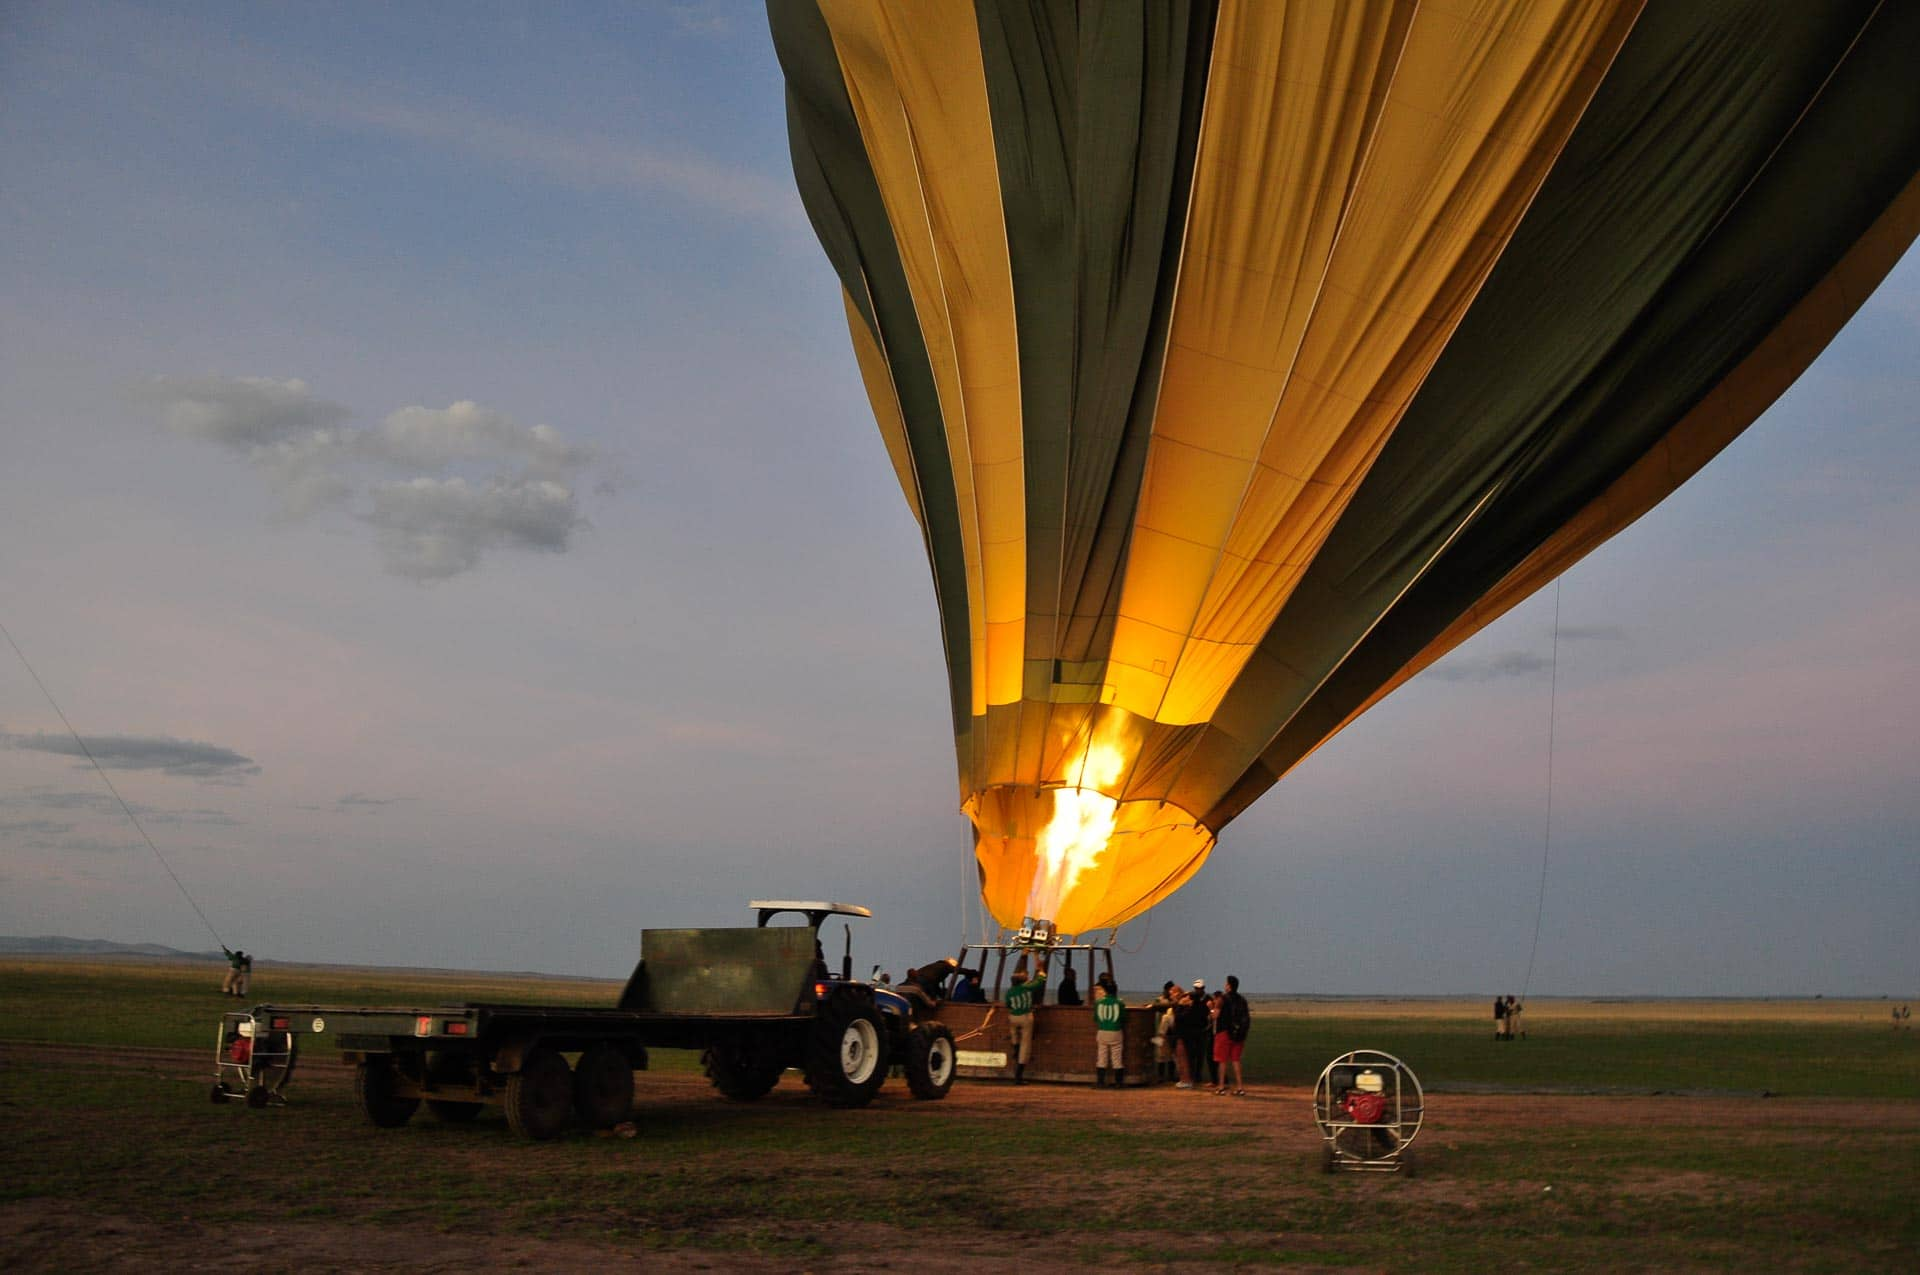 Masai-Mara-Ballonfahrt-Kenia-Globetrotter-Select-3